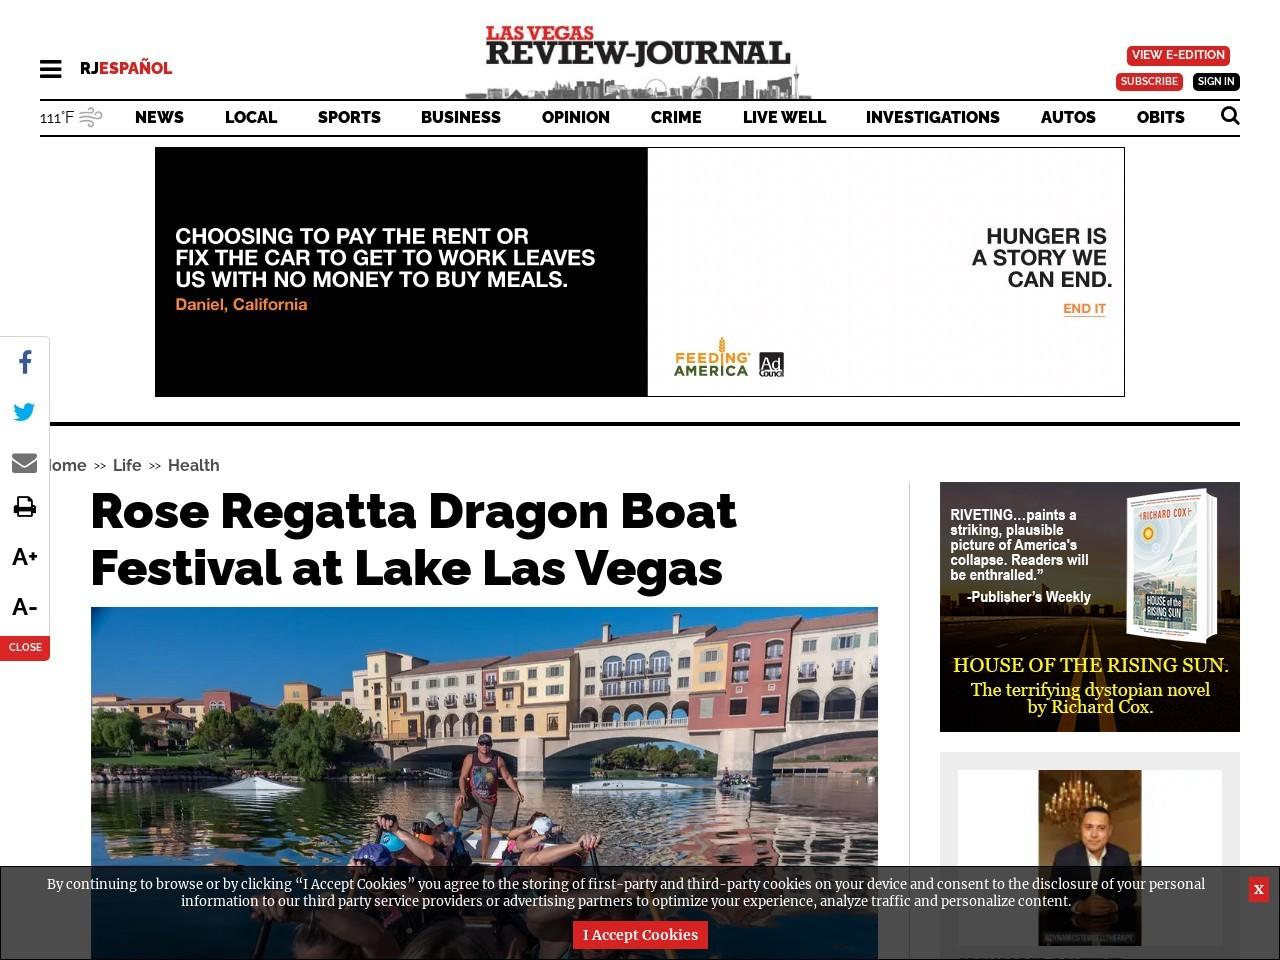 Rose Regatta Dragon Boat Festival at Lake Las Vegas